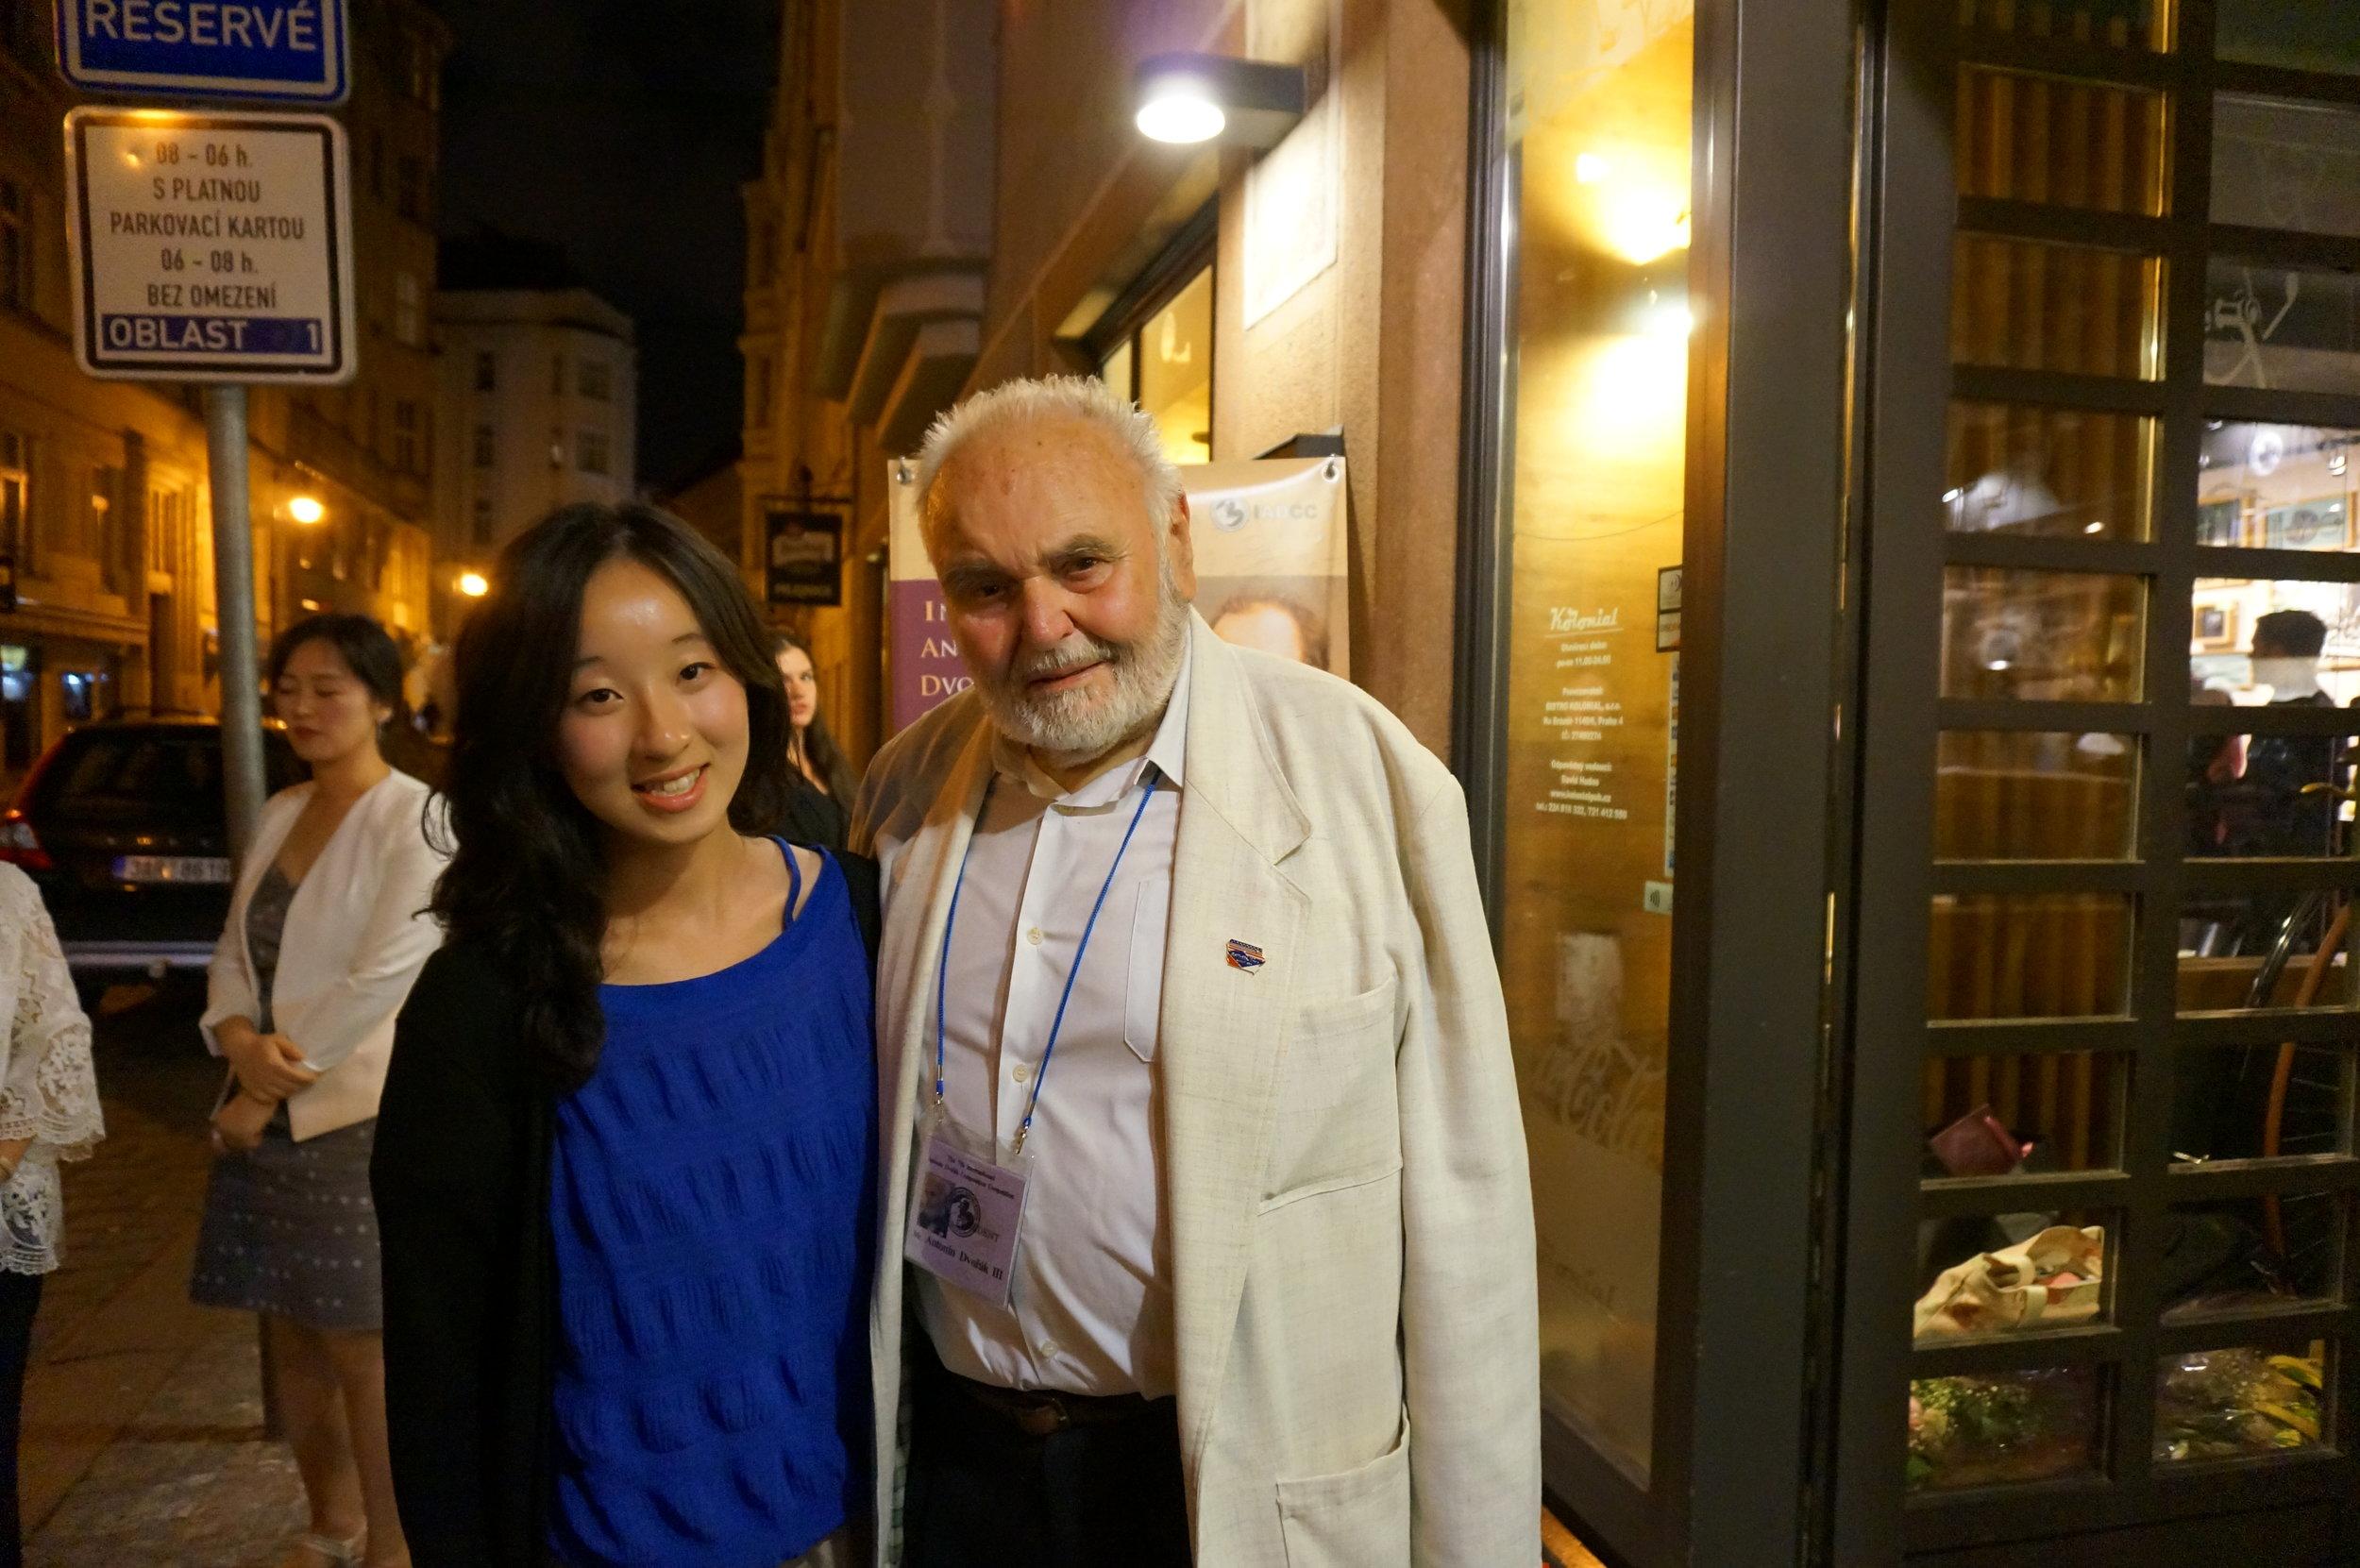 With Antonín Dvorak III